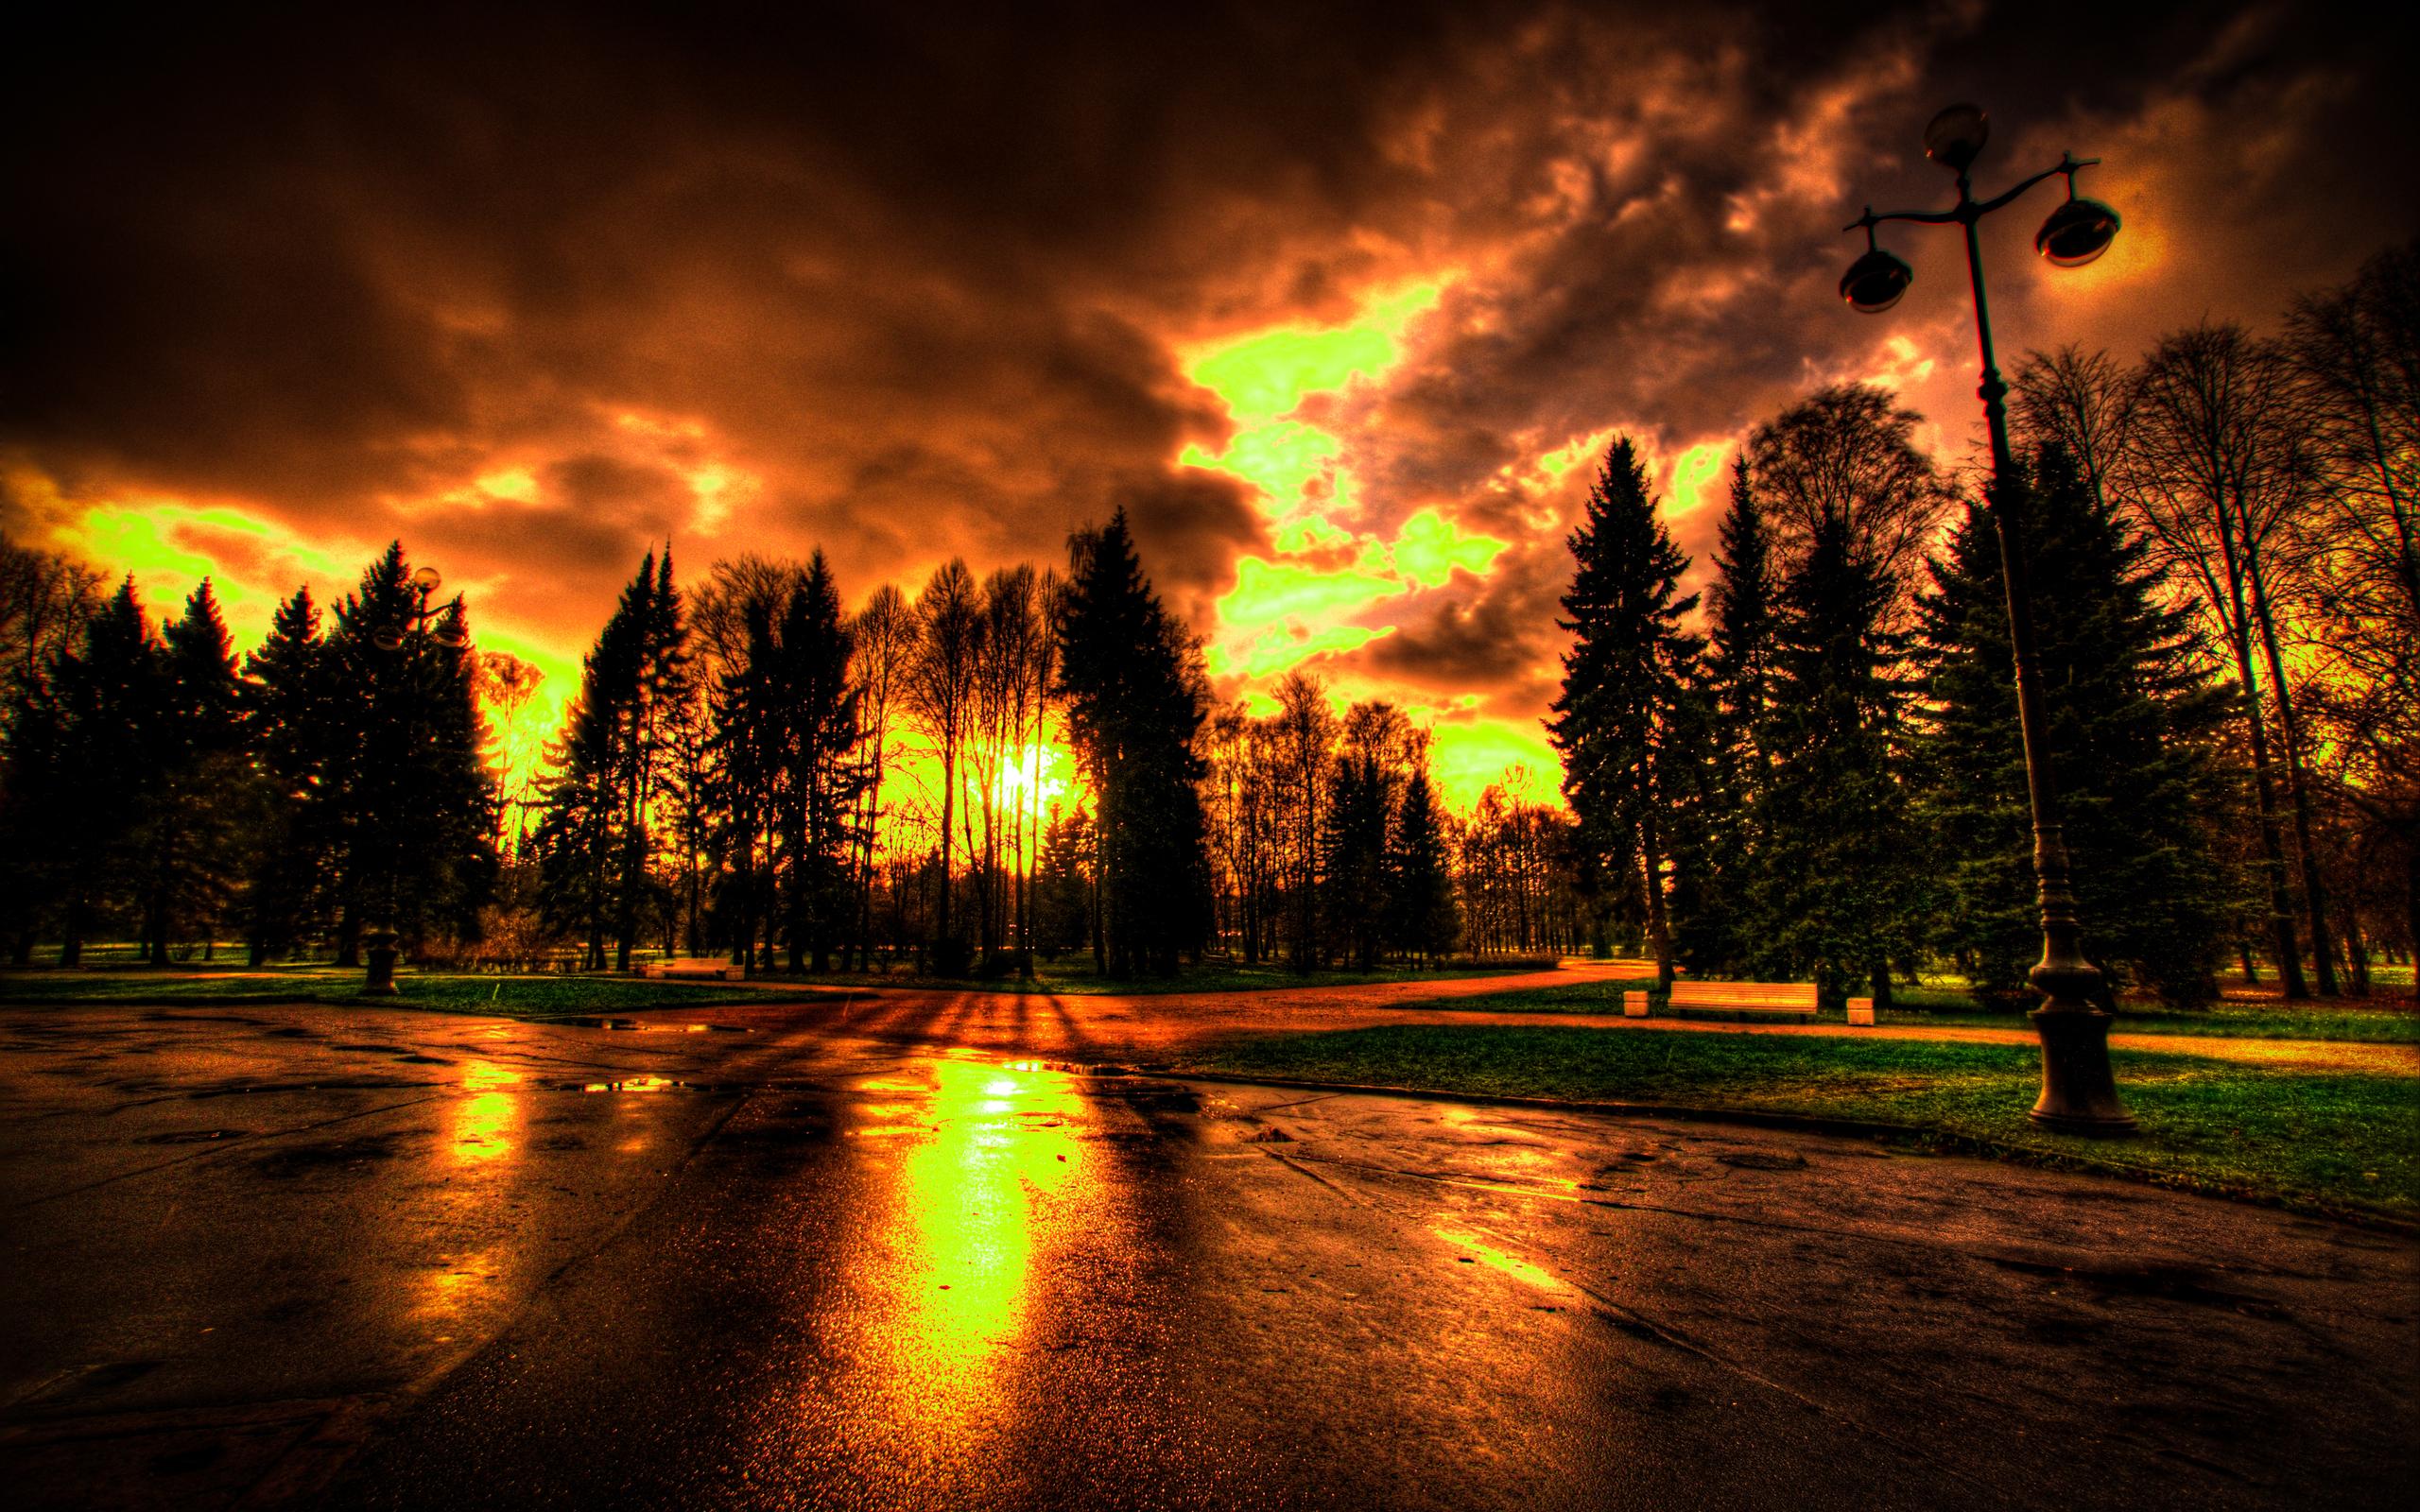 Pôr do Sol Papel de Parede HD Plano de Fundo 2560x1600